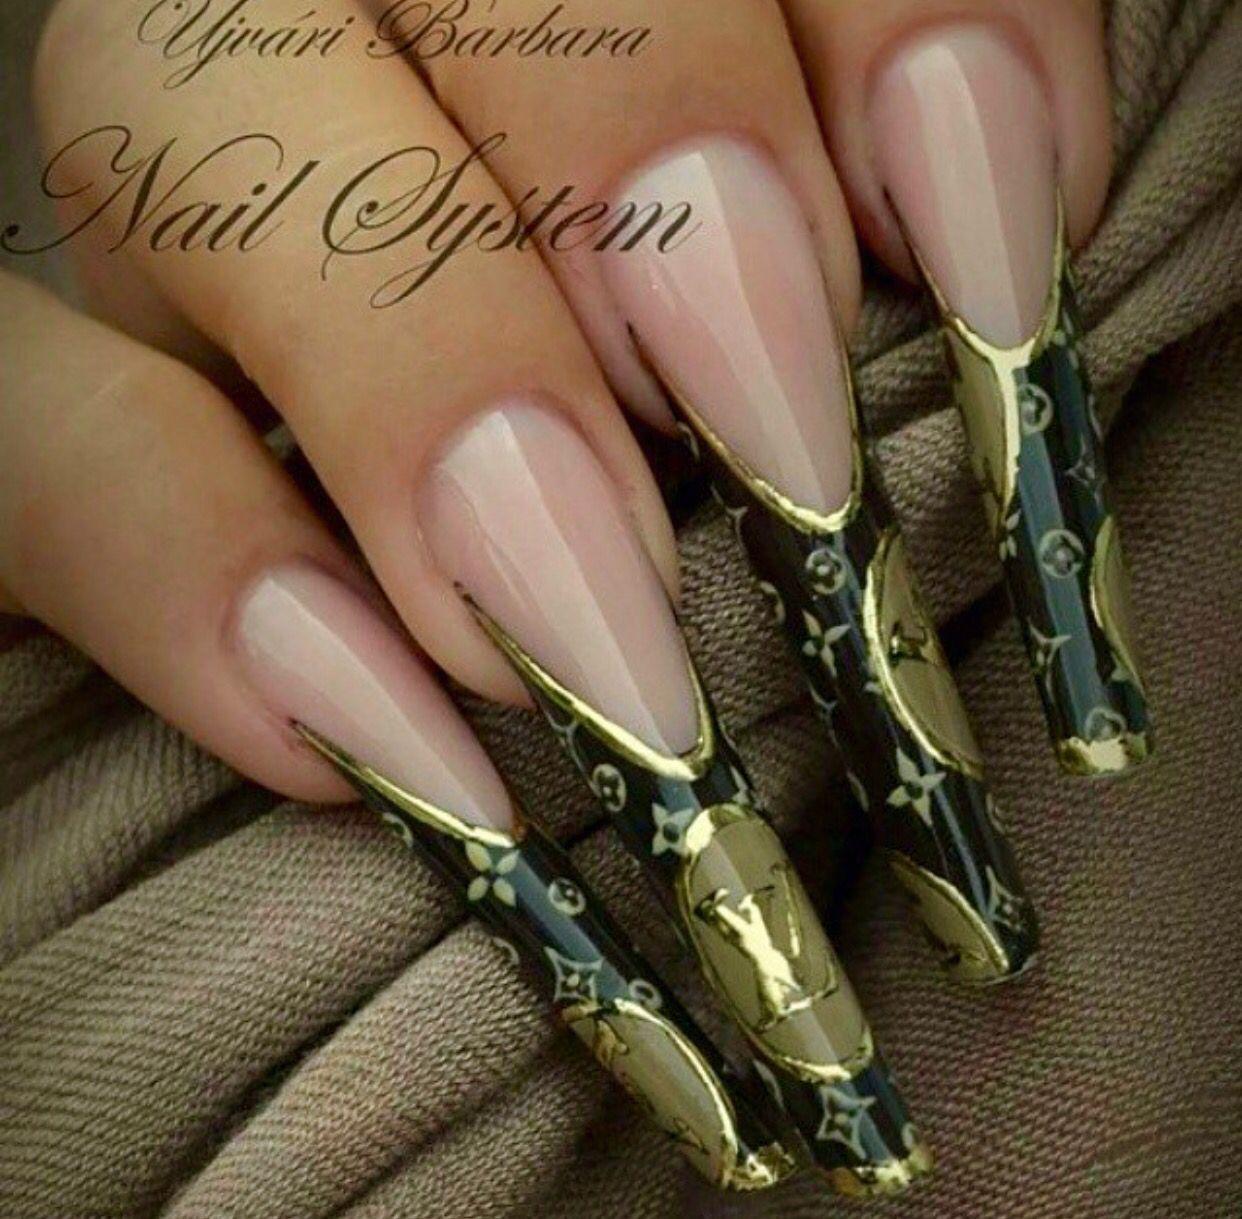 Black and gold Louis Vuitton nails | korom formak | Pinterest ...